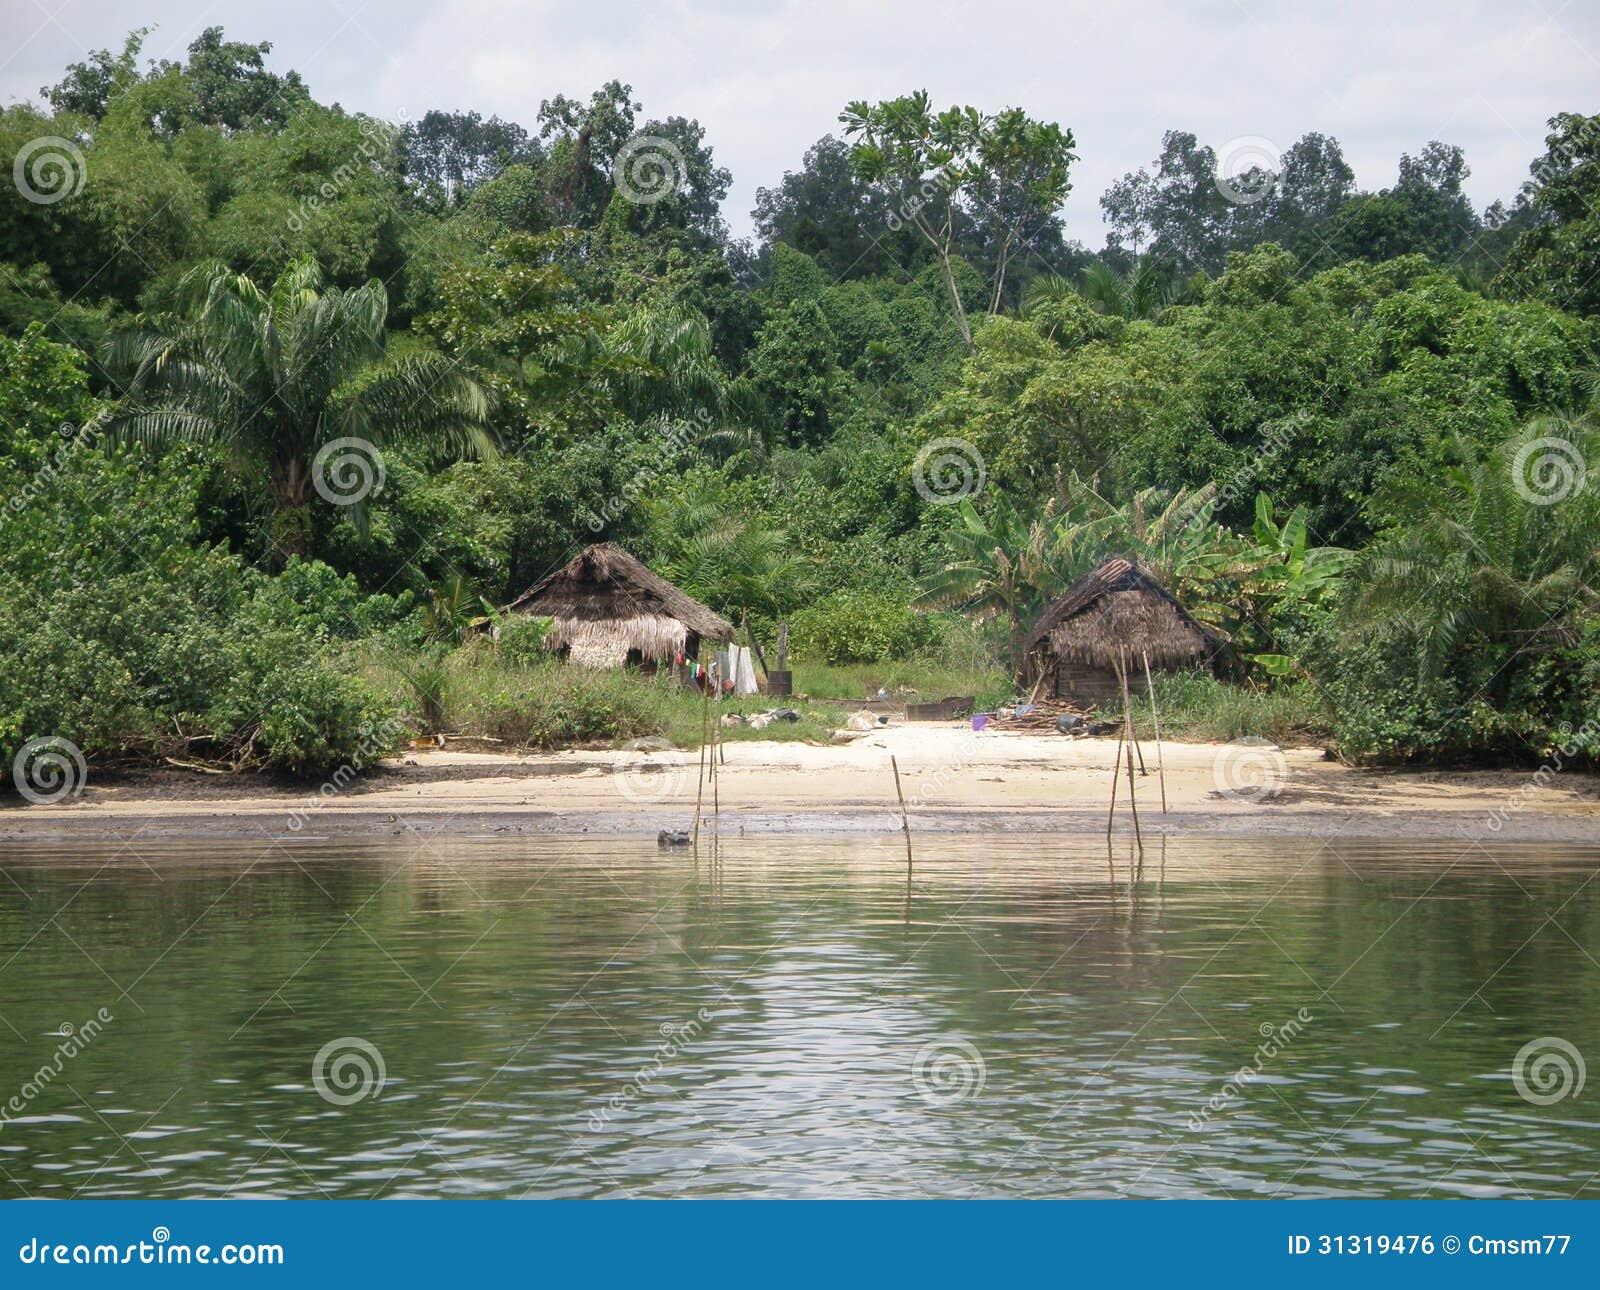 Wildernis in Nigeria